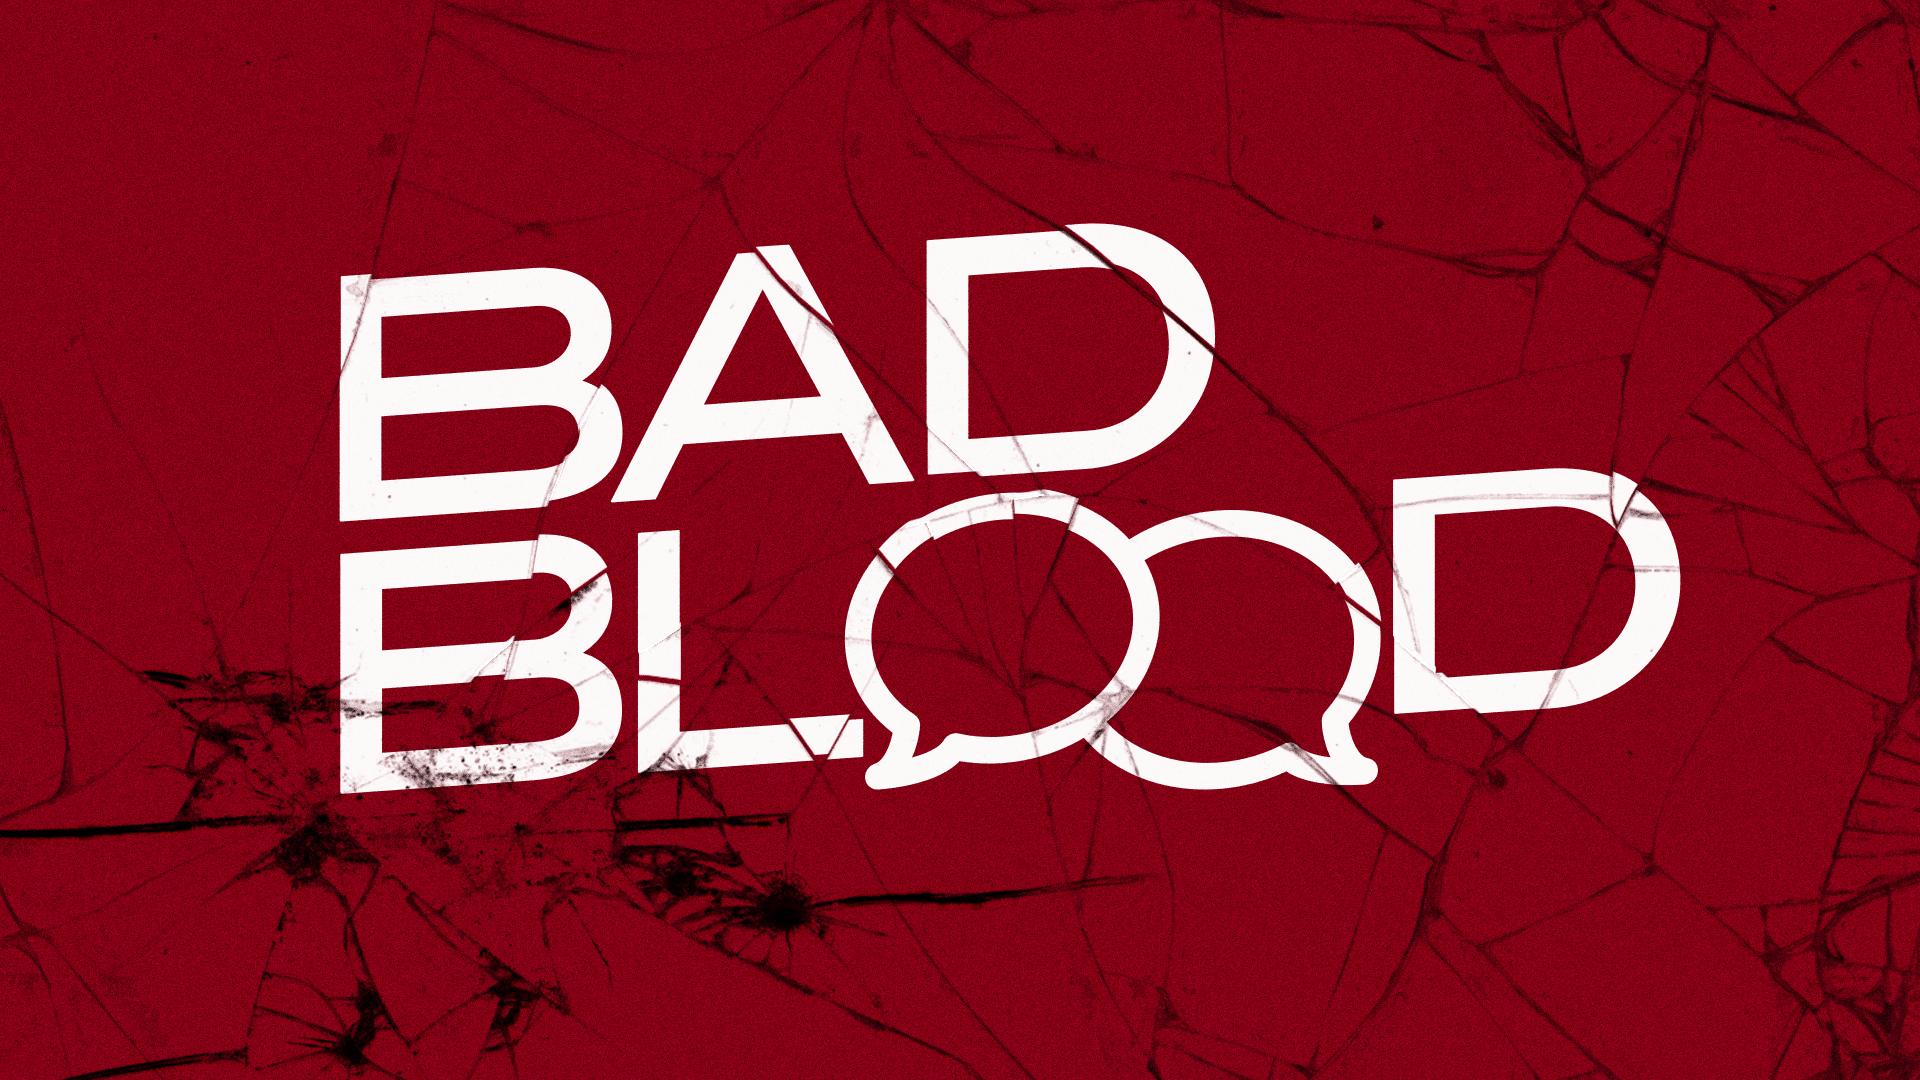 Bad-Blood-1920x1080